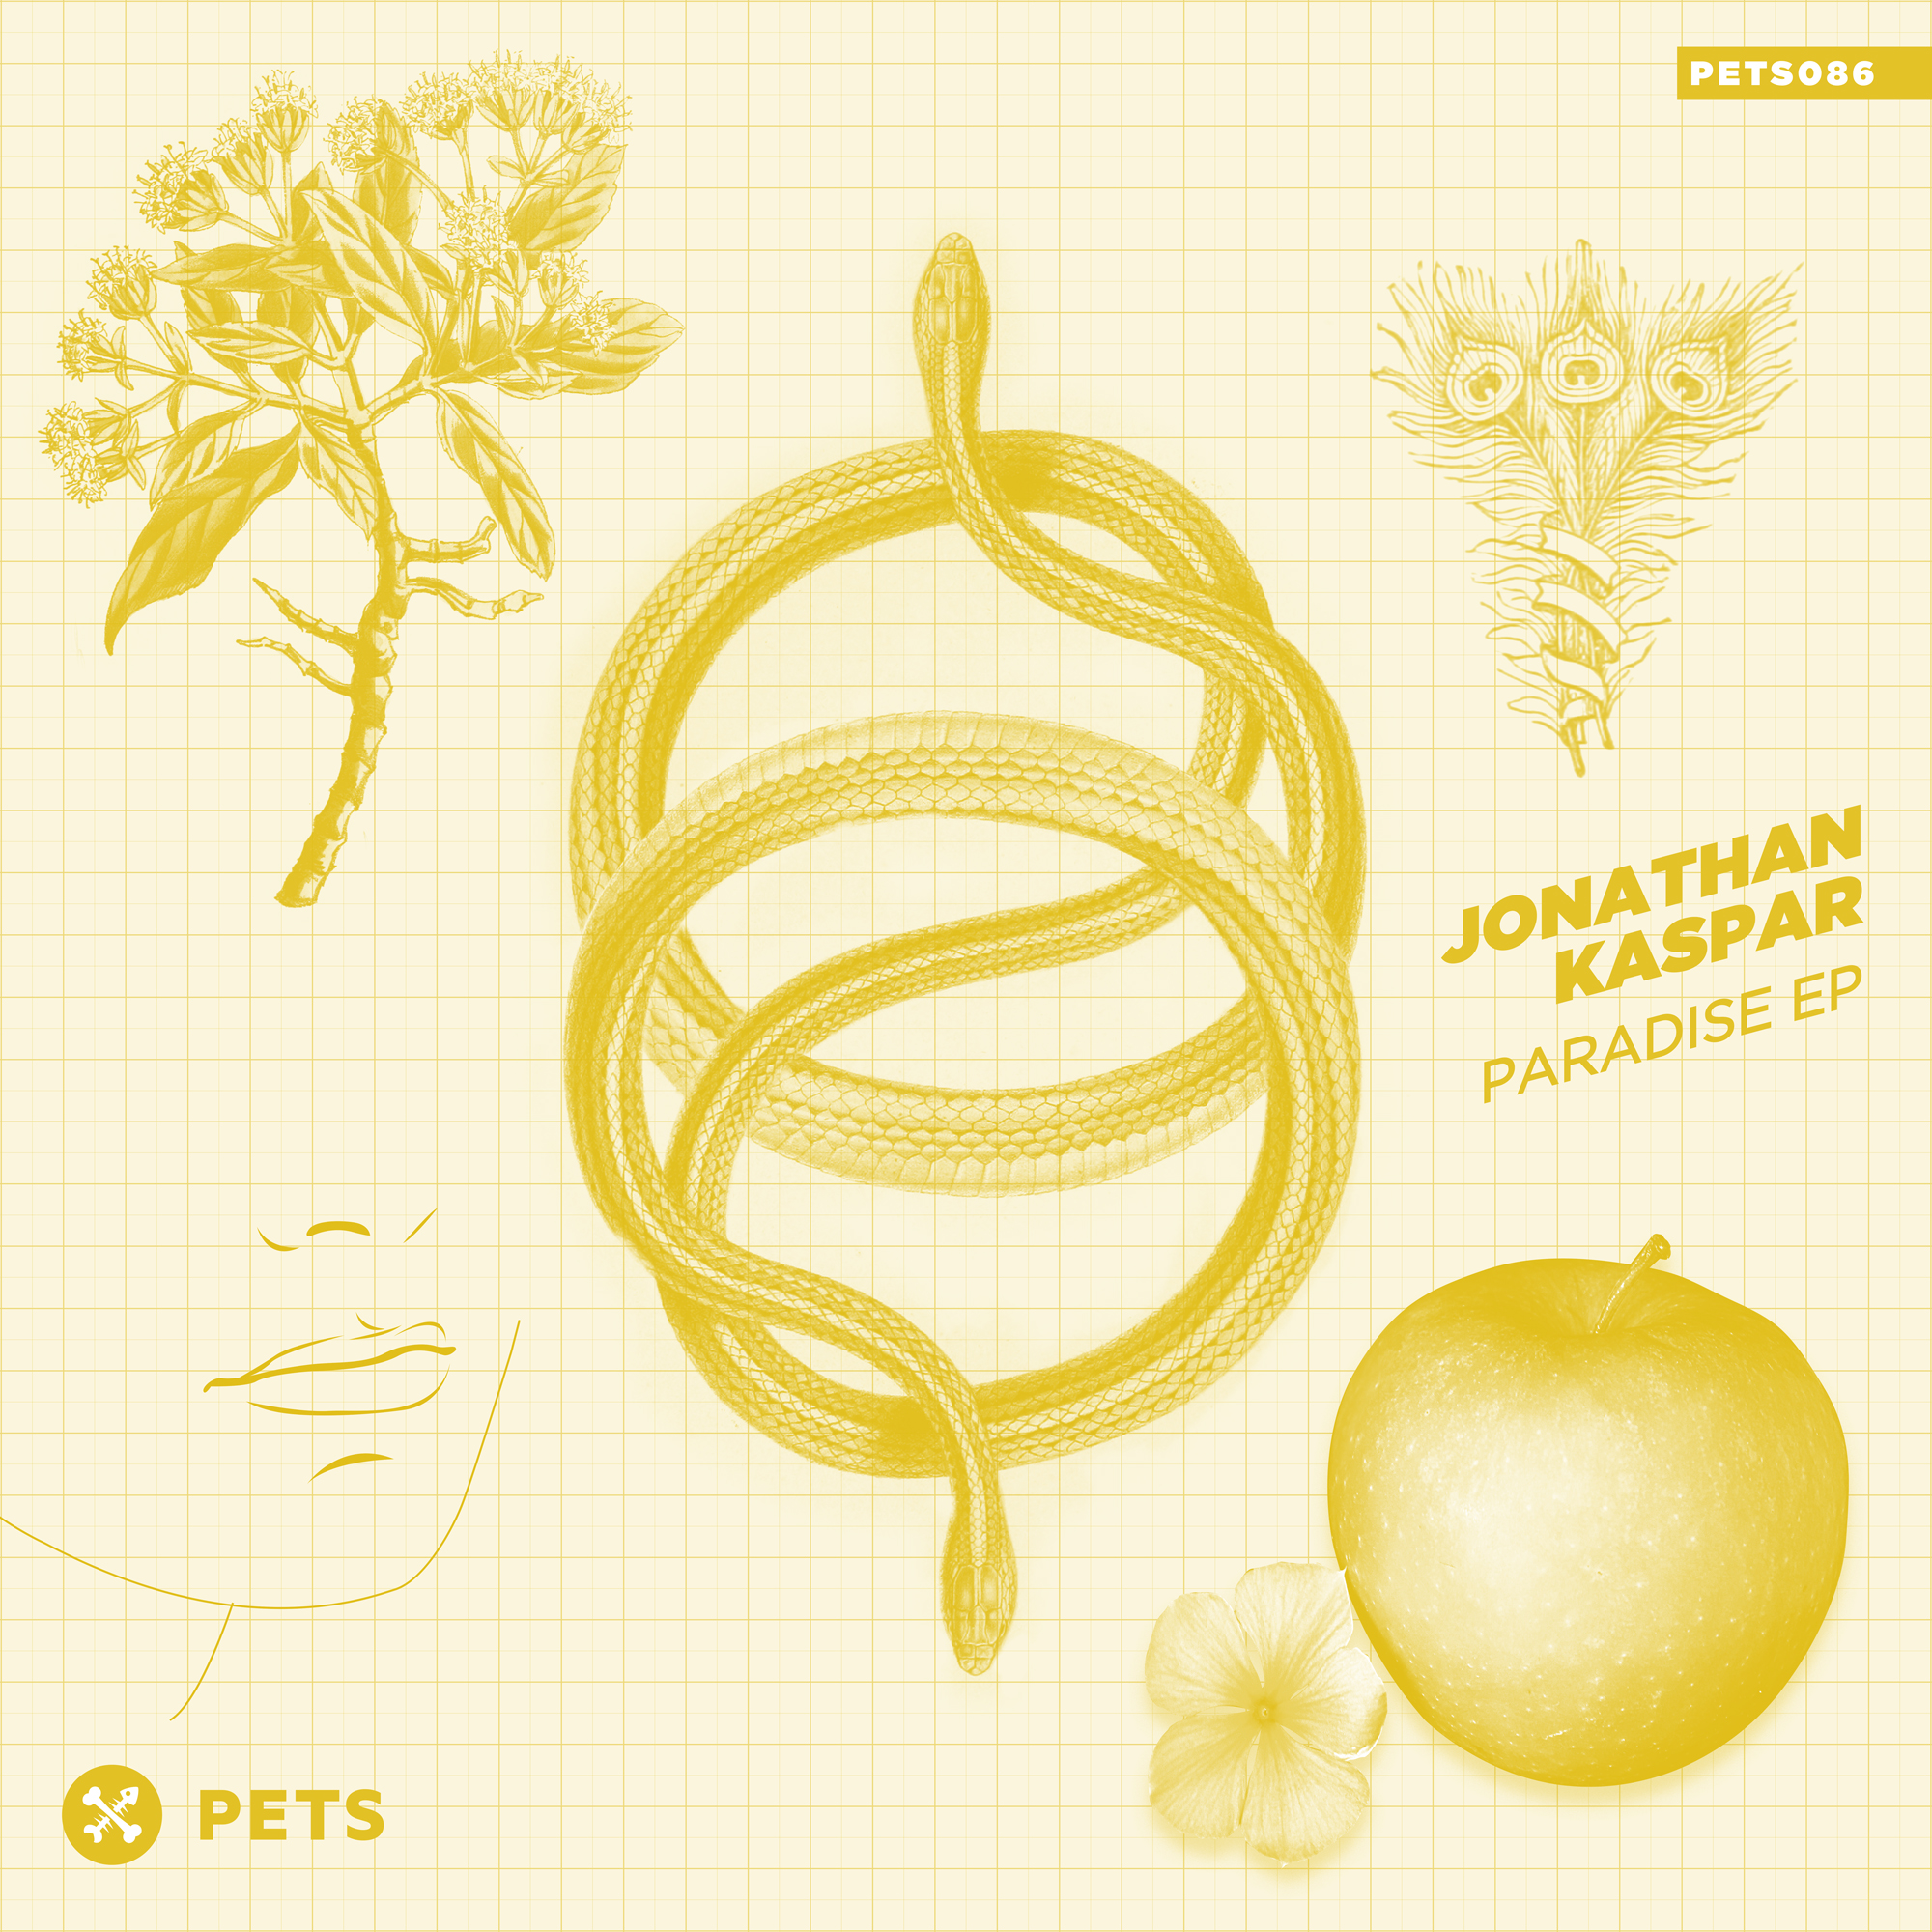 Jonathan Kaspar - Paradise EP